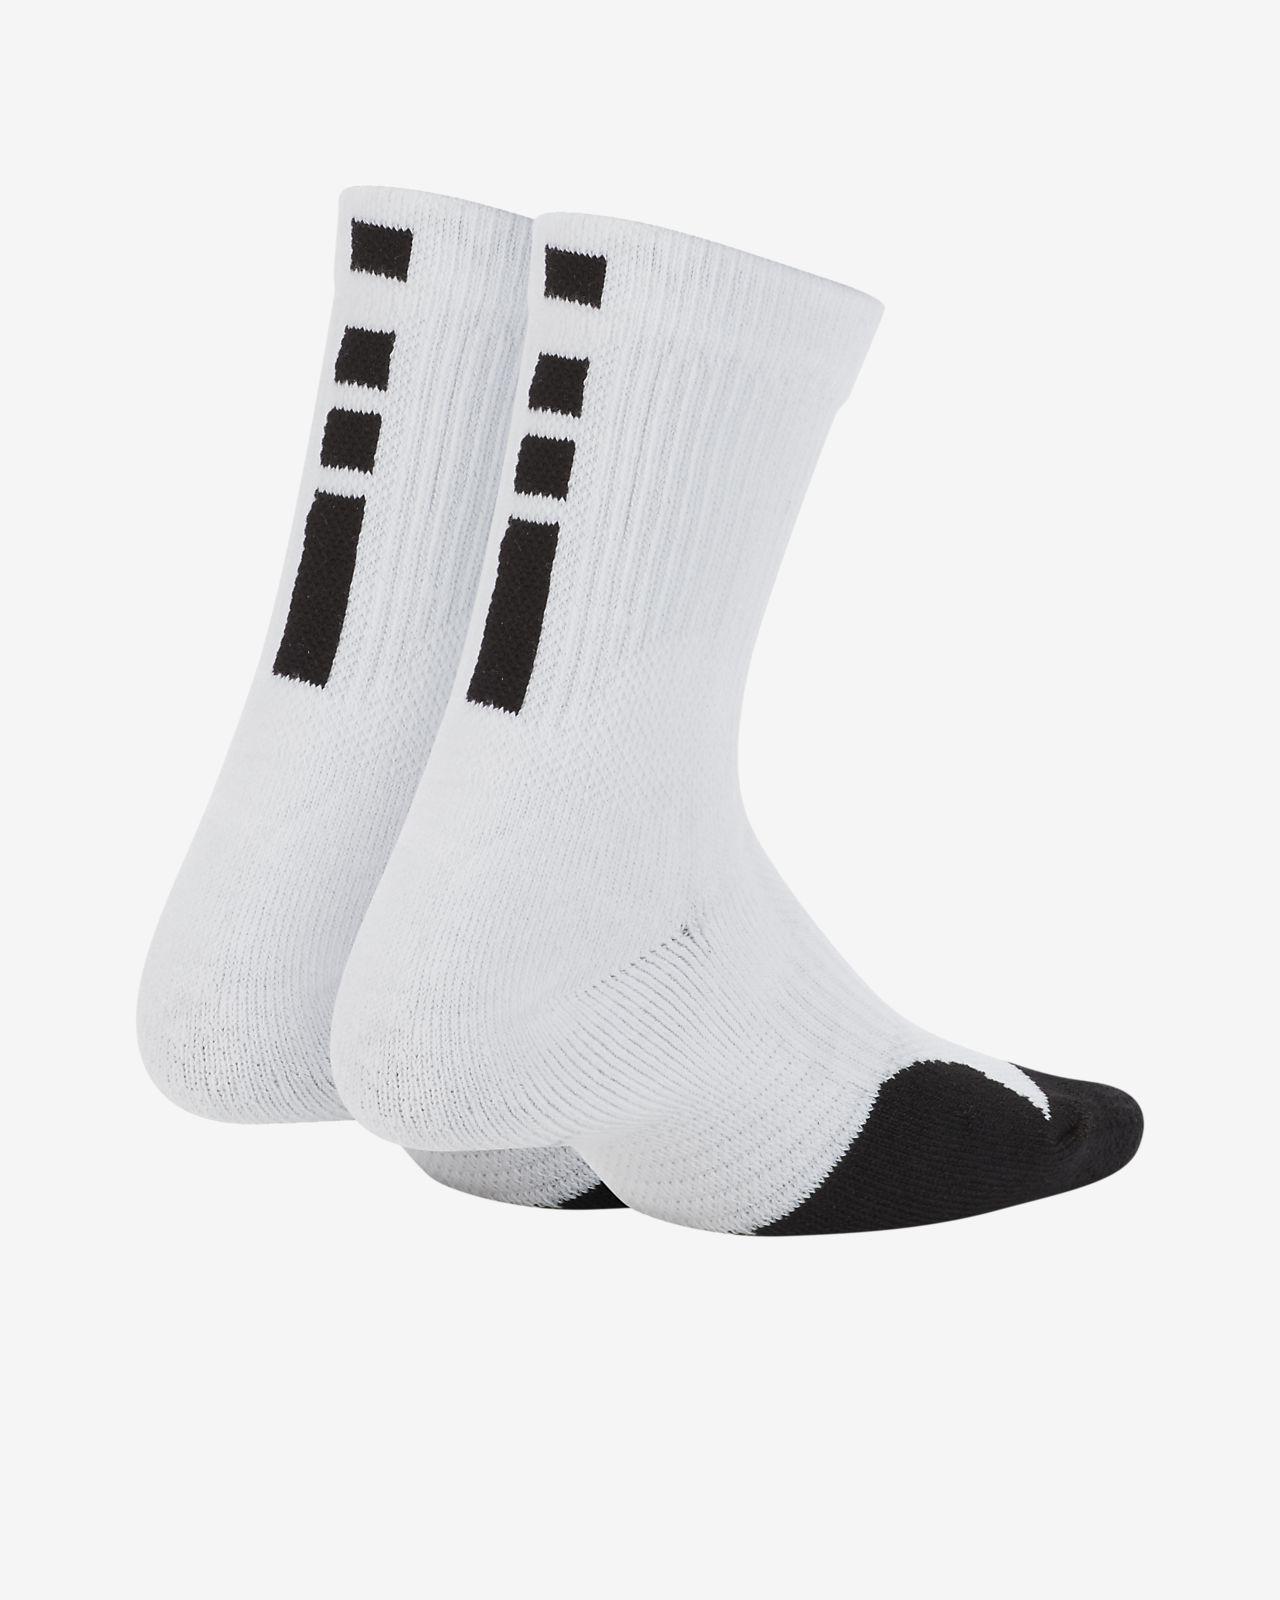 Nike Elite Little Kids' Crew Socks (2 Pairs)